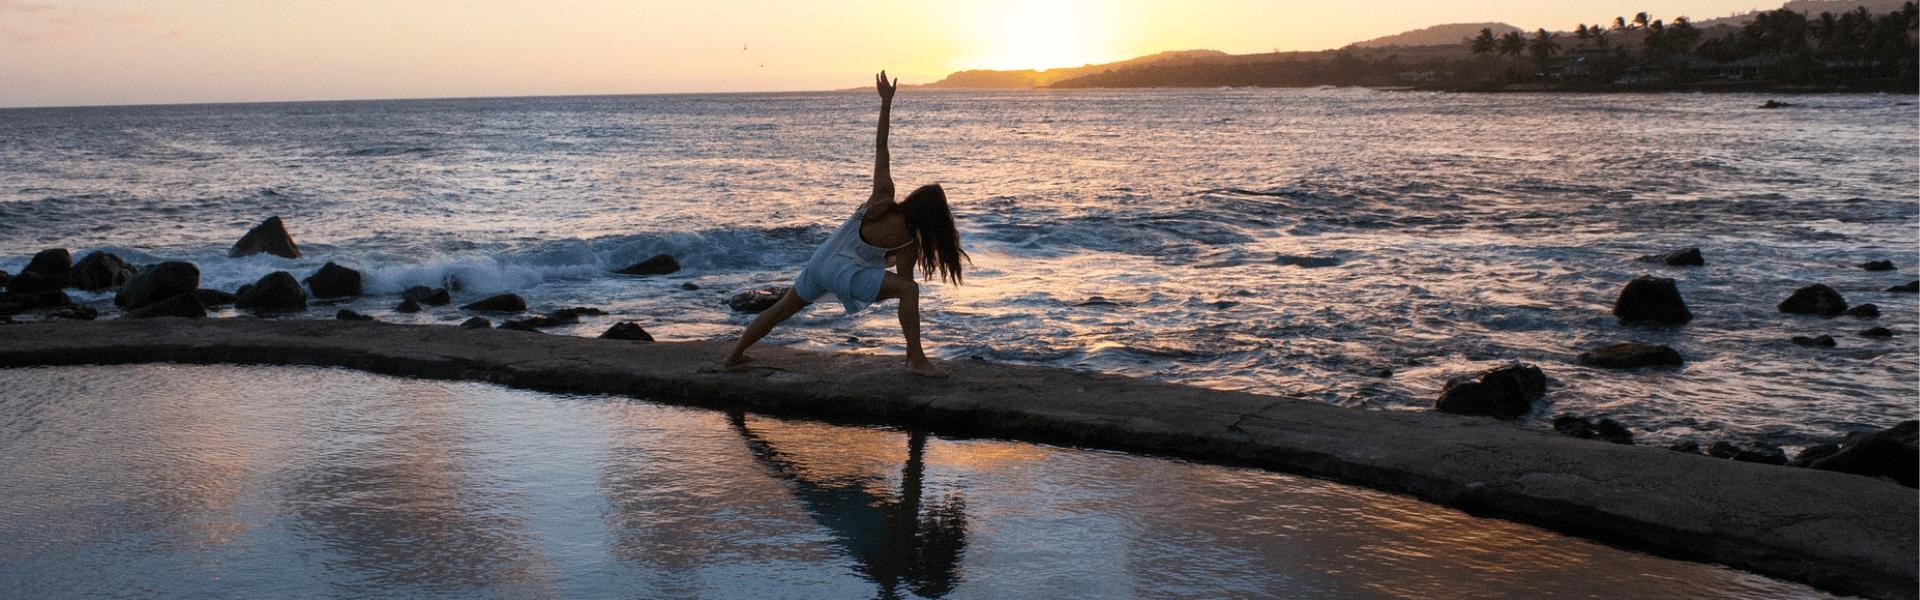 yoga-reisen-strand